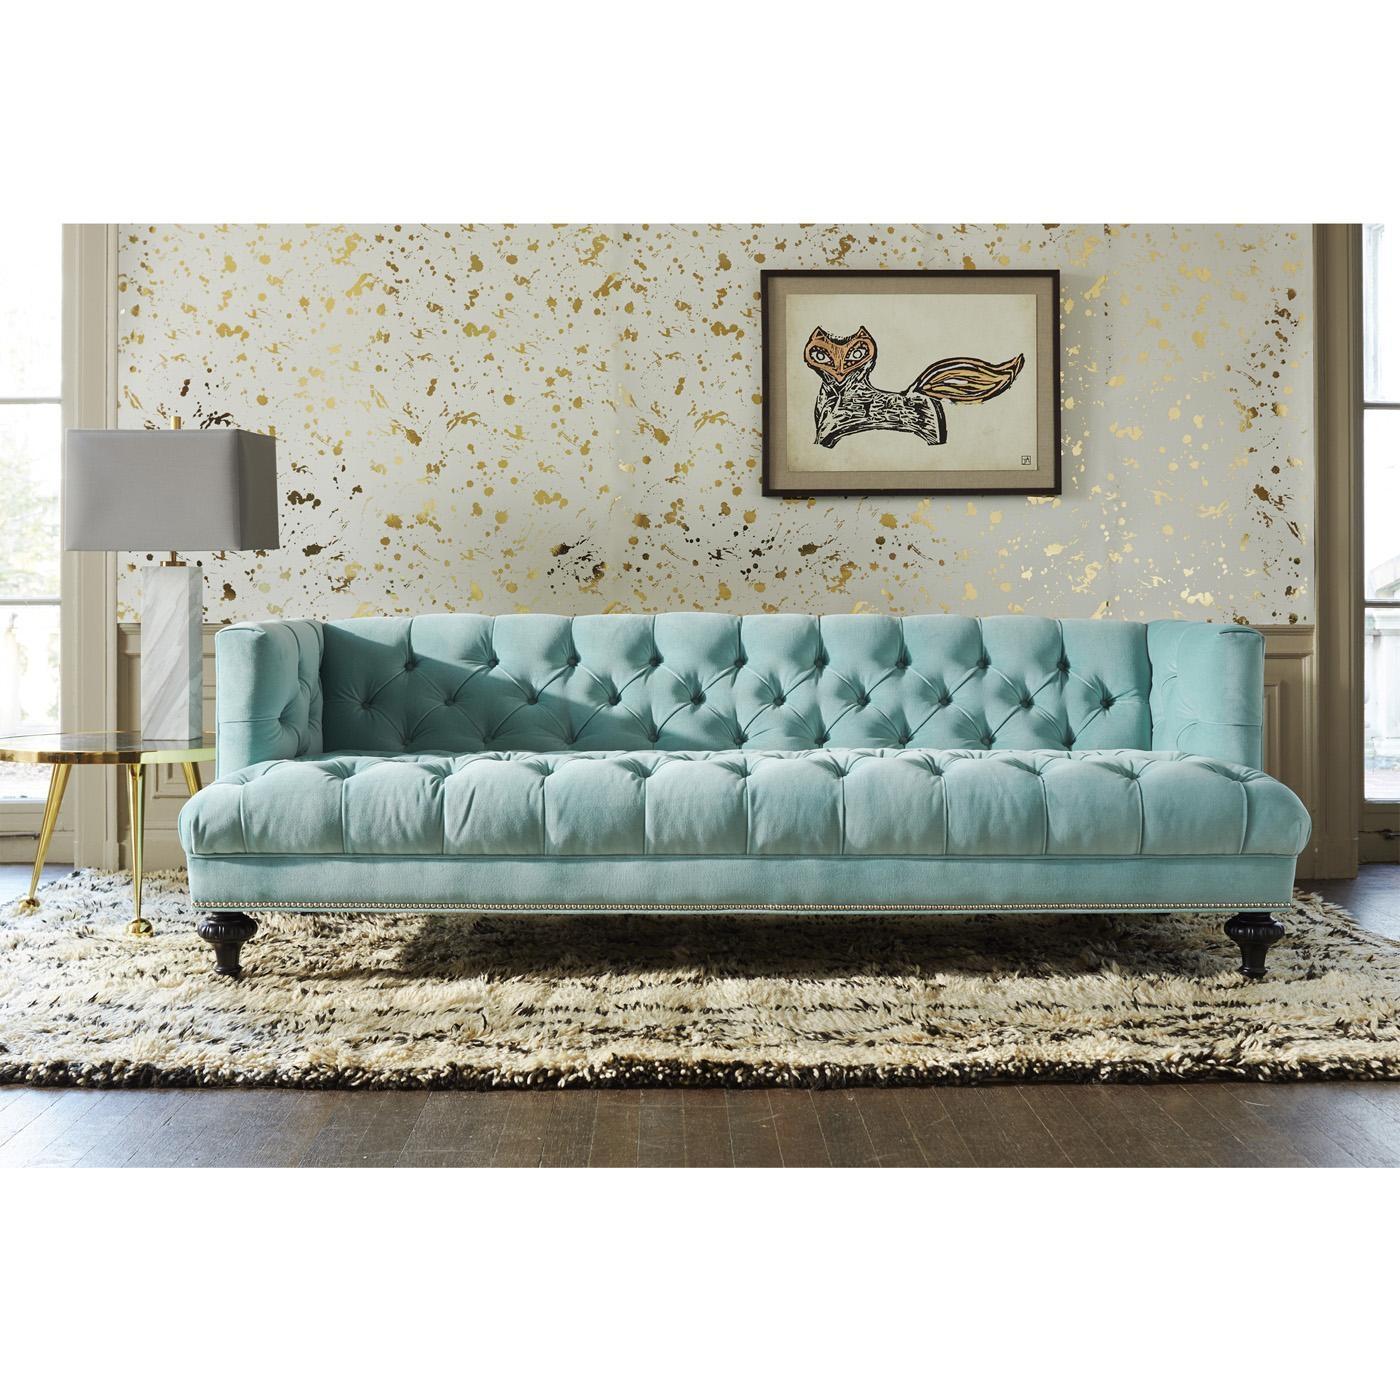 Baxter T Arm Sofa | Modern Furniture | Jonathan Adler Pertaining To Jonathan Sofa (Image 3 of 20)